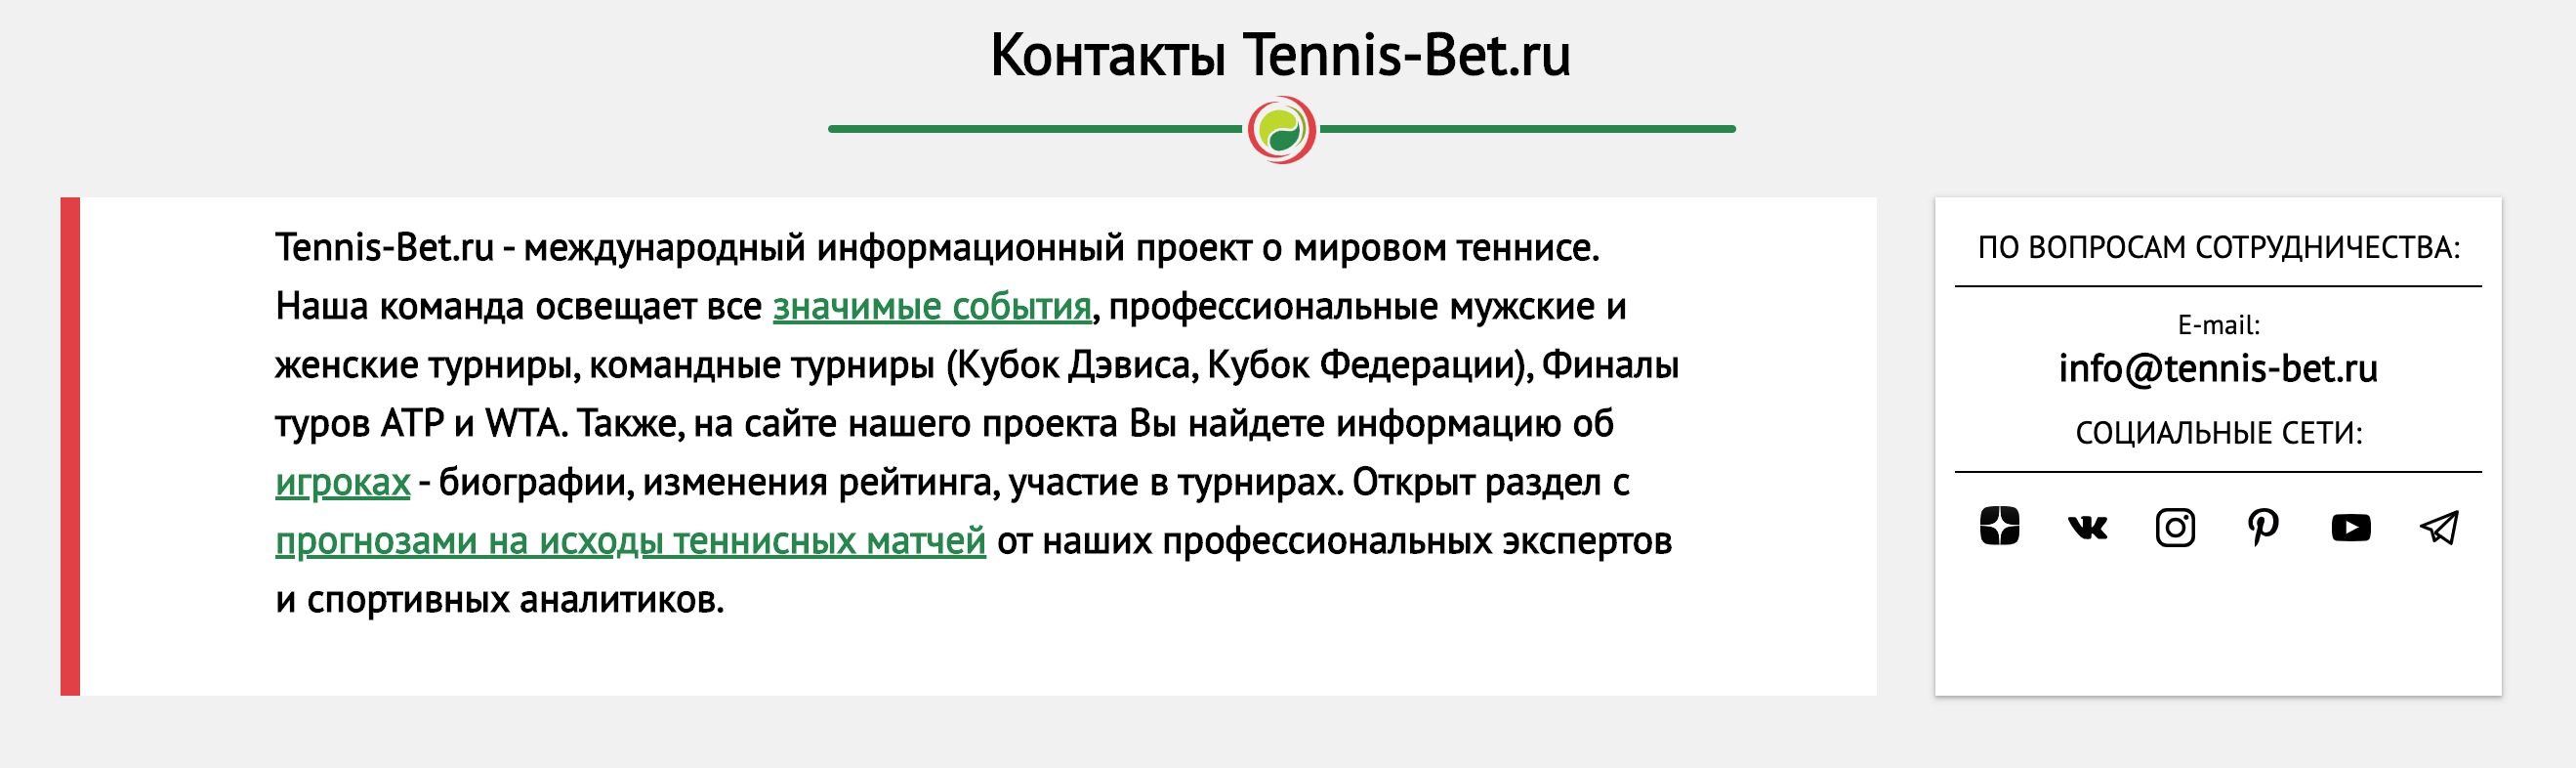 Контакты Tennis-bet.ru